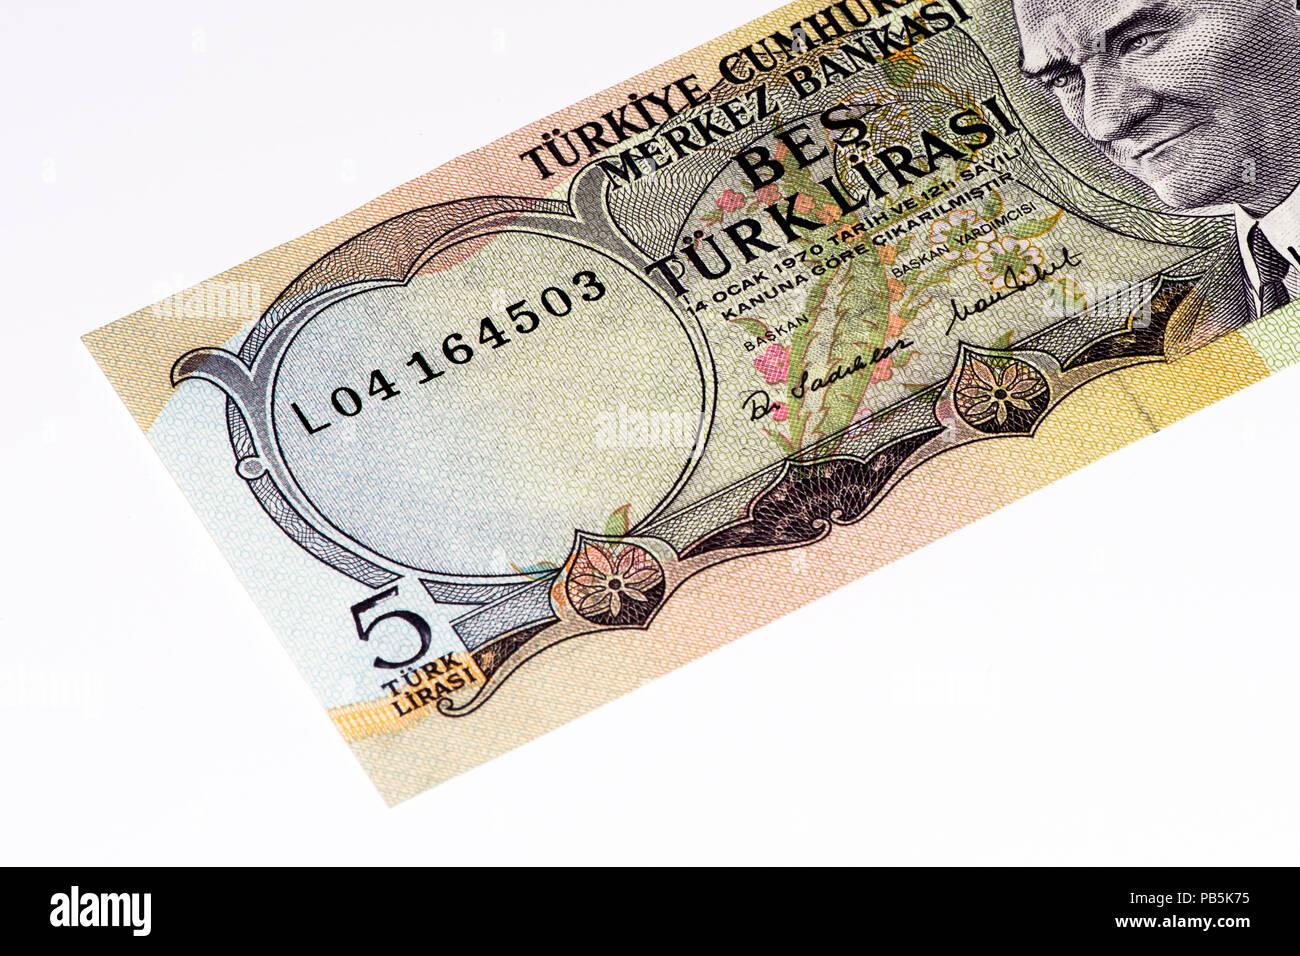 5 Turkish liras bank note. Turkish lira is the national currency of Turkey Stock Photo